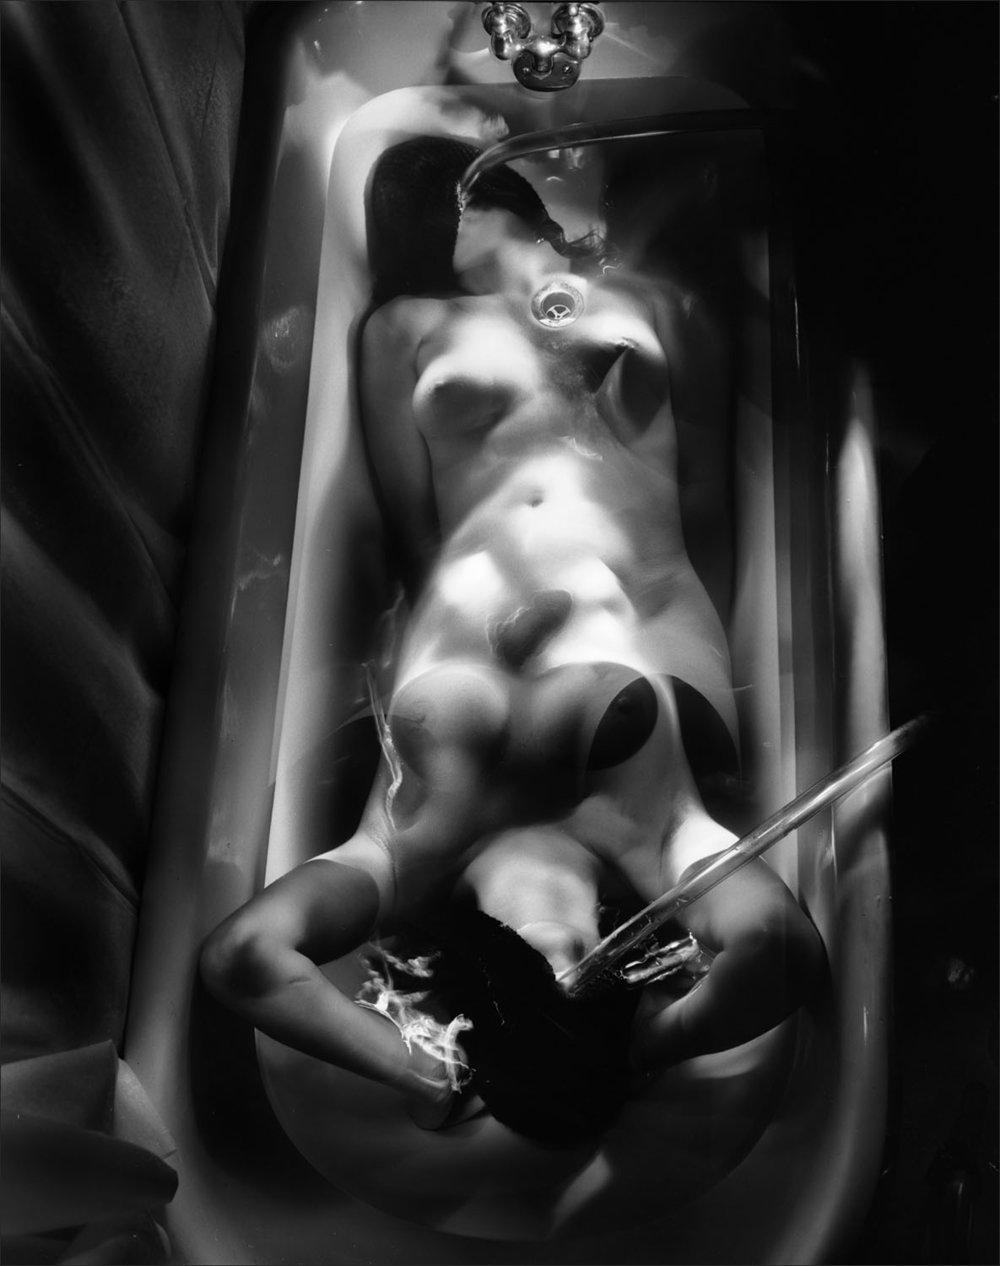 Bath Tubs ,  Susan Clarke #2, 1995